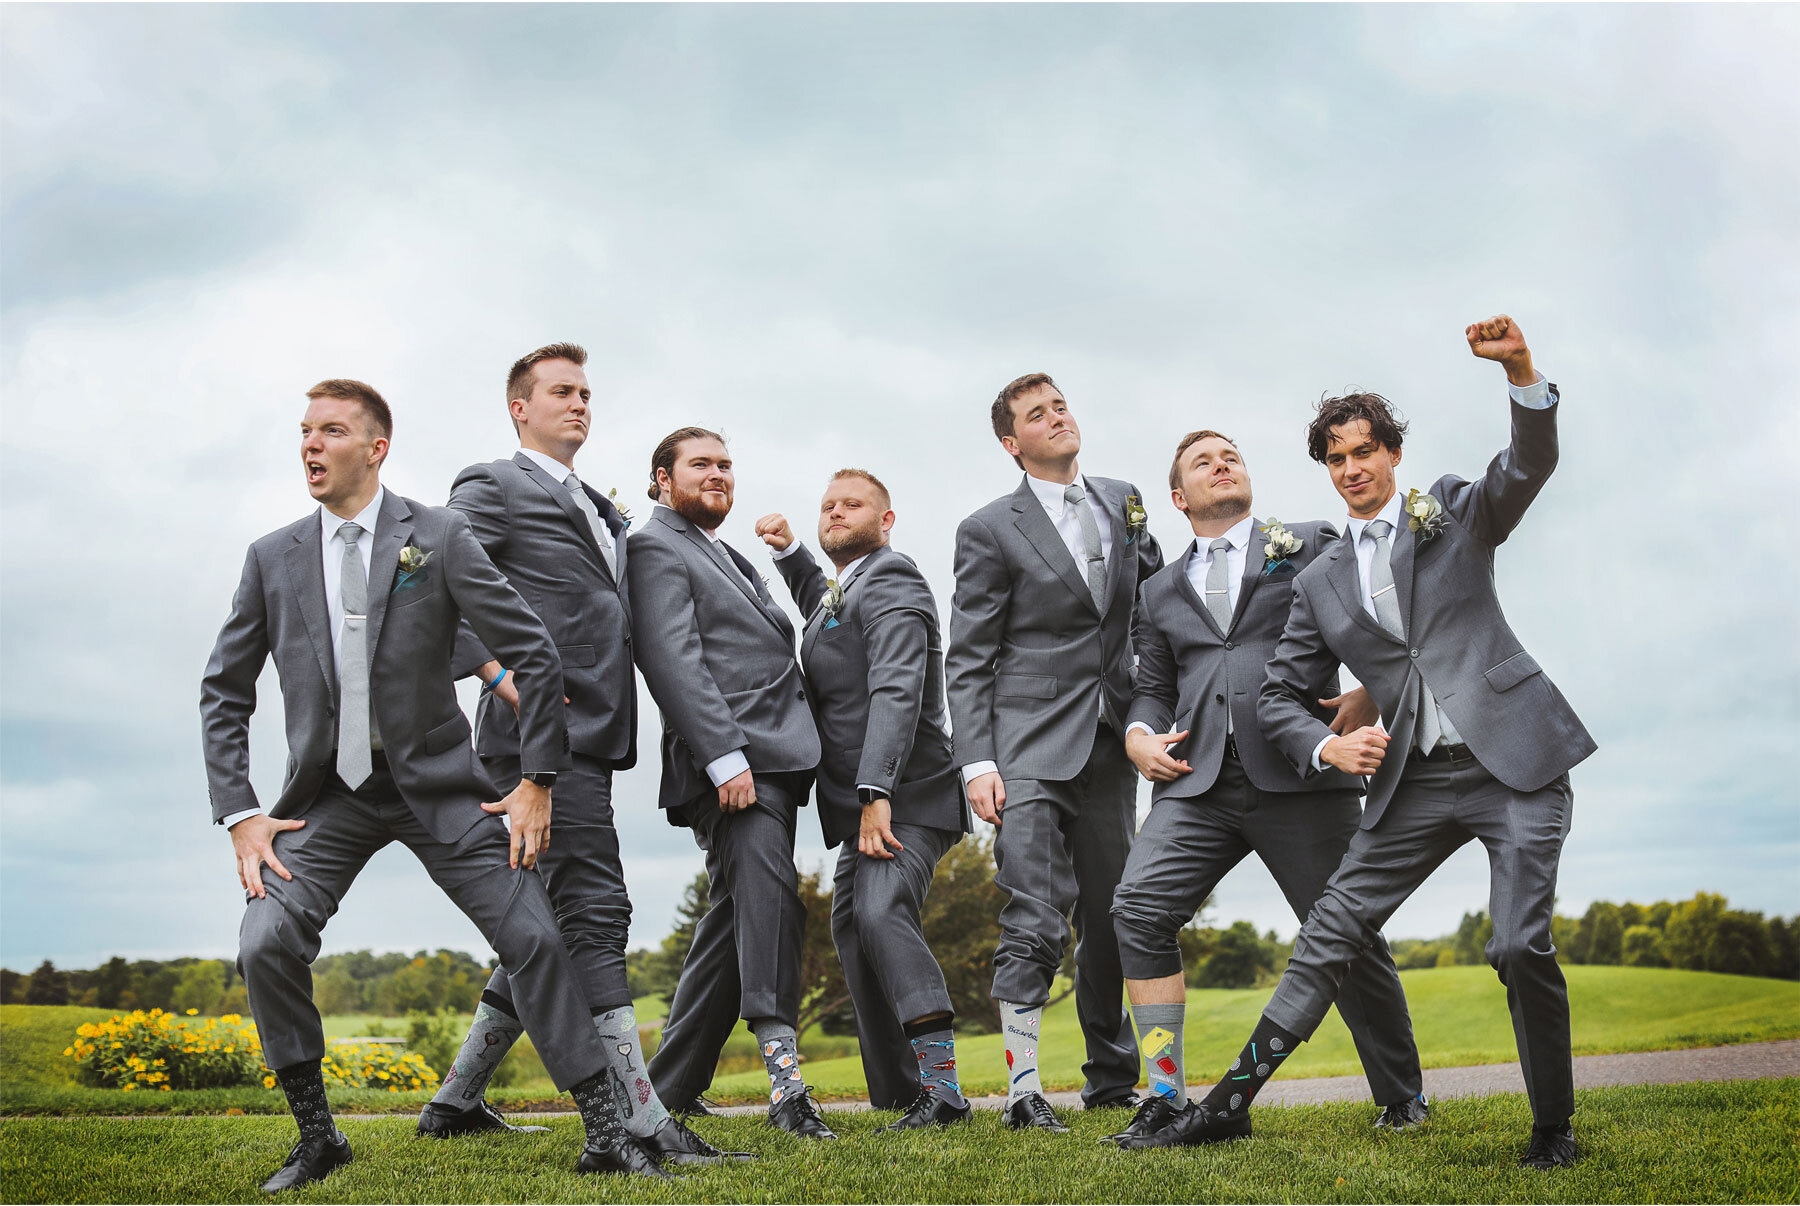 08-Vick-Photography-Minneapolis-Minnesota-Wedding-Rush-Creek-Golf-Club-Groom-Groomsmen-Amanda-and-Michael.jpg